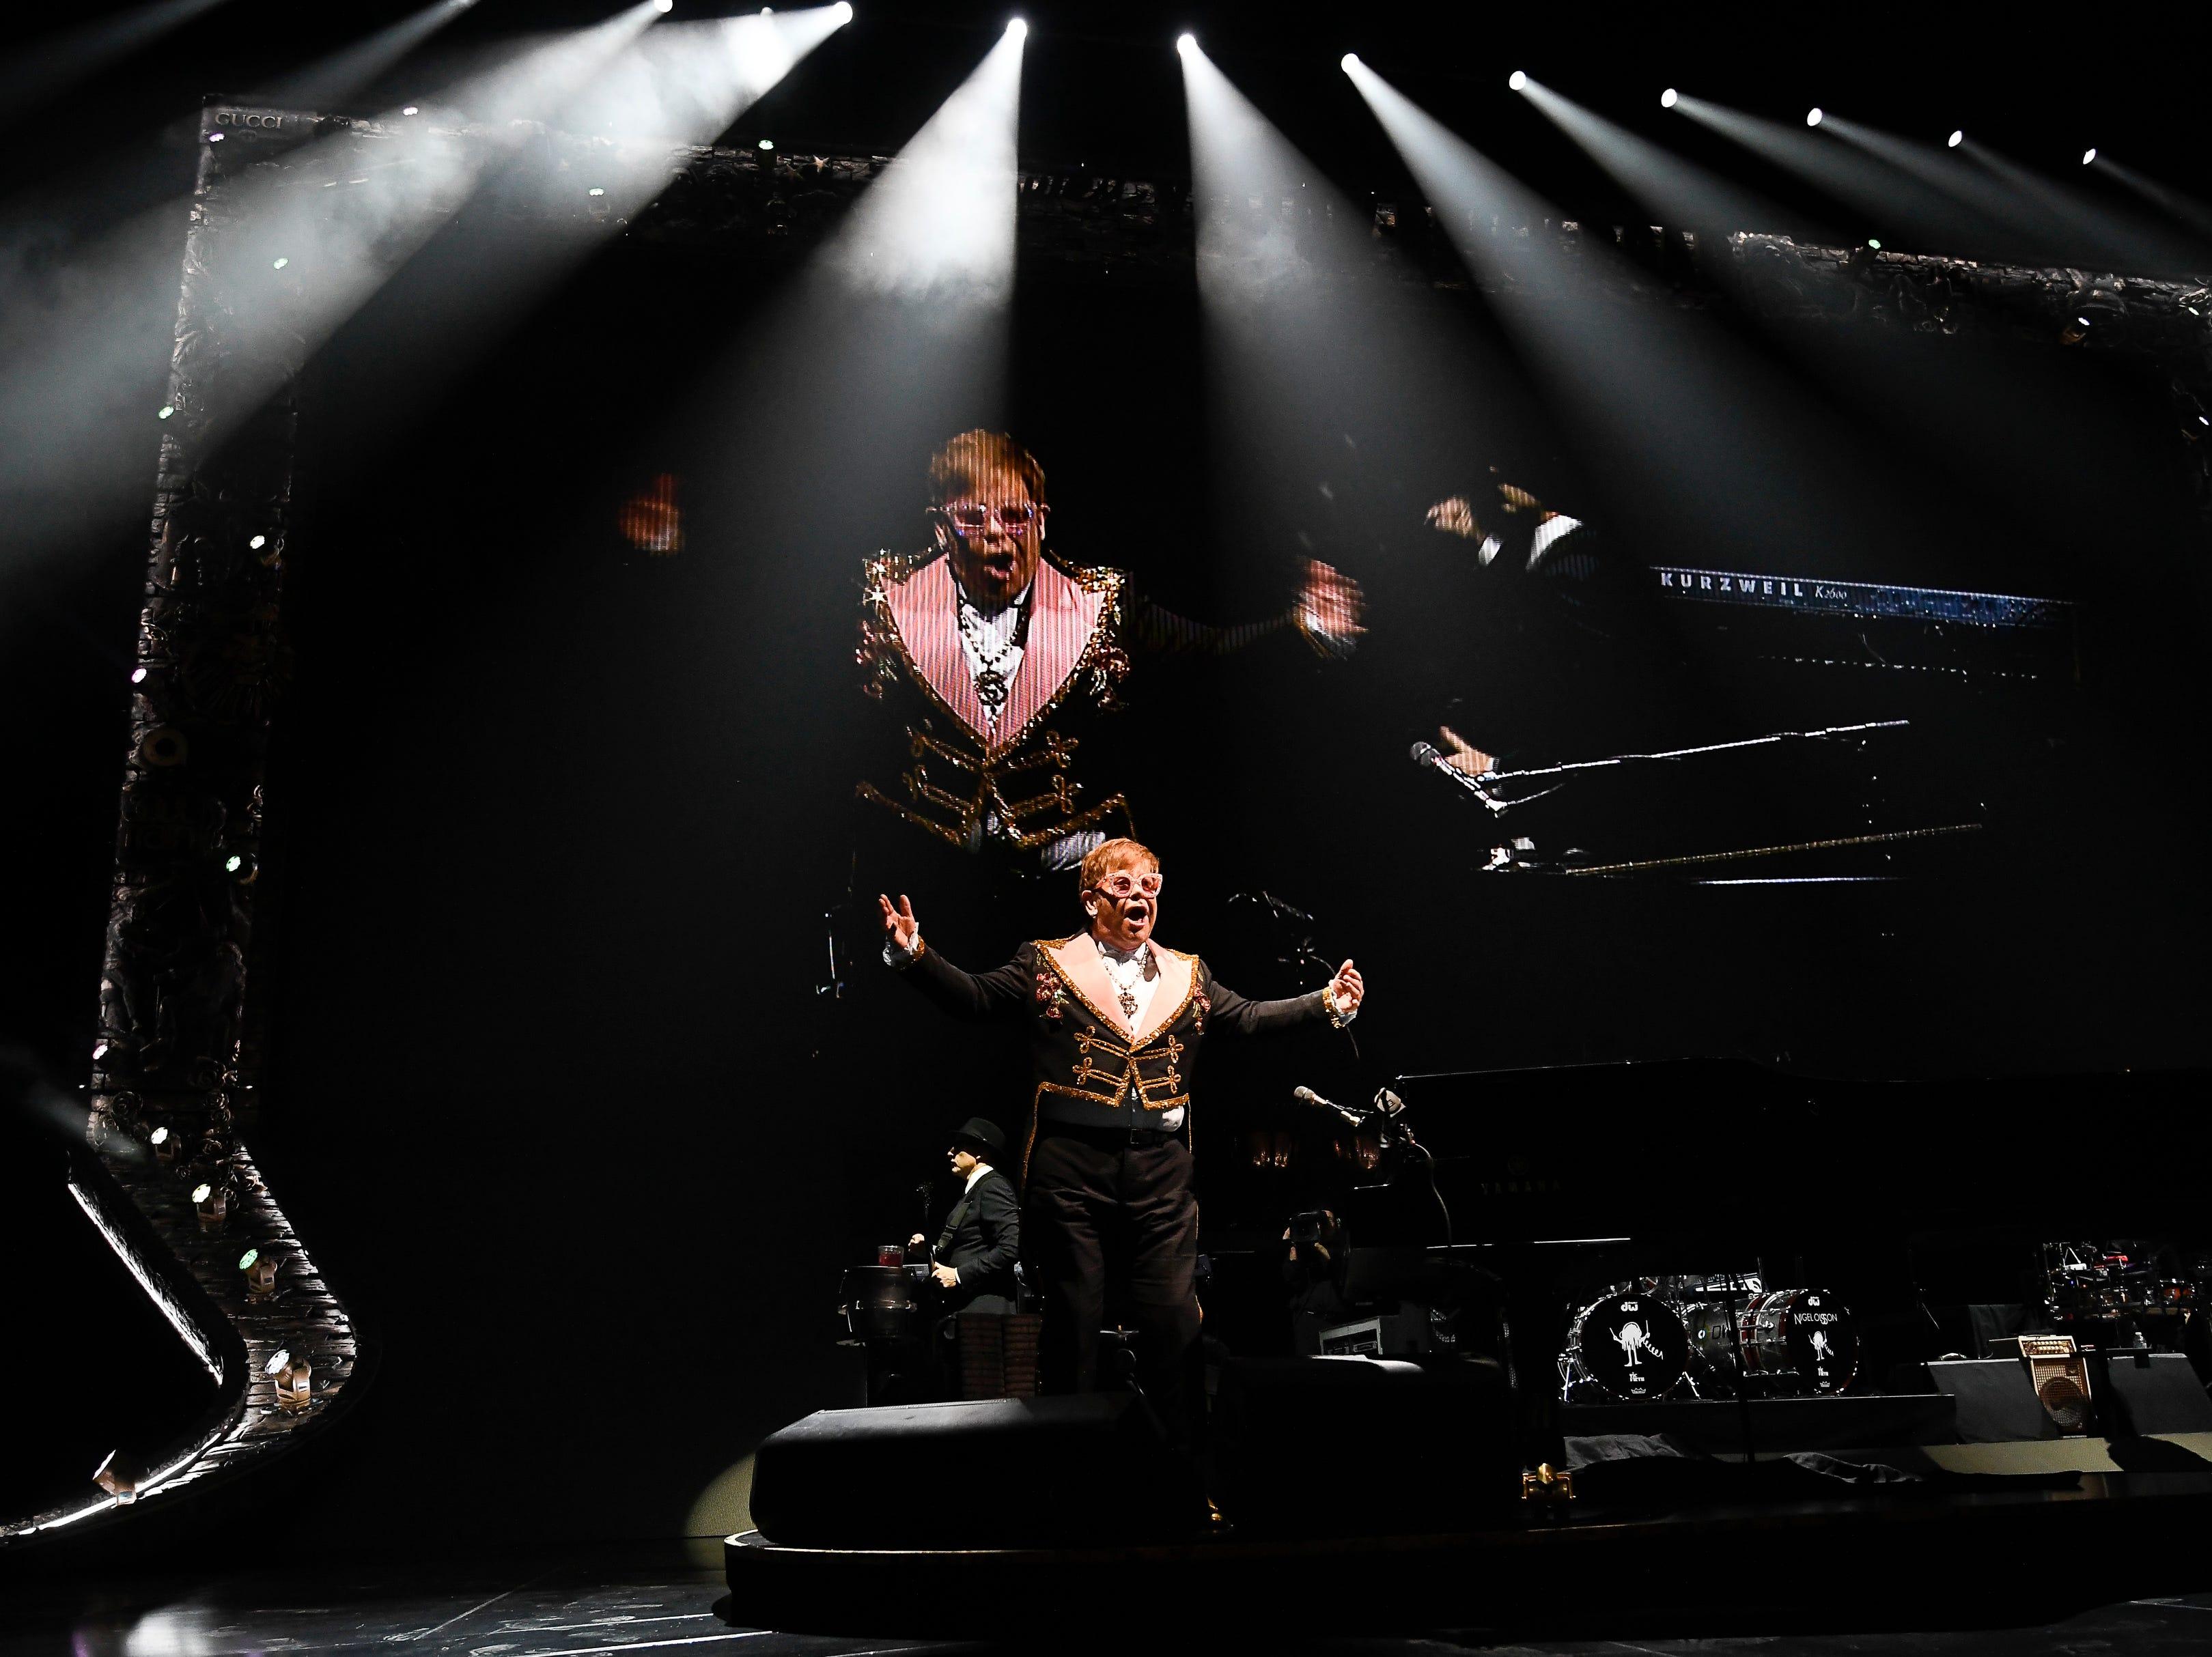 Elton John performs at Bridgestone Arena Wednesday, Oct. 24, 2018, in Nashville, Tenn.